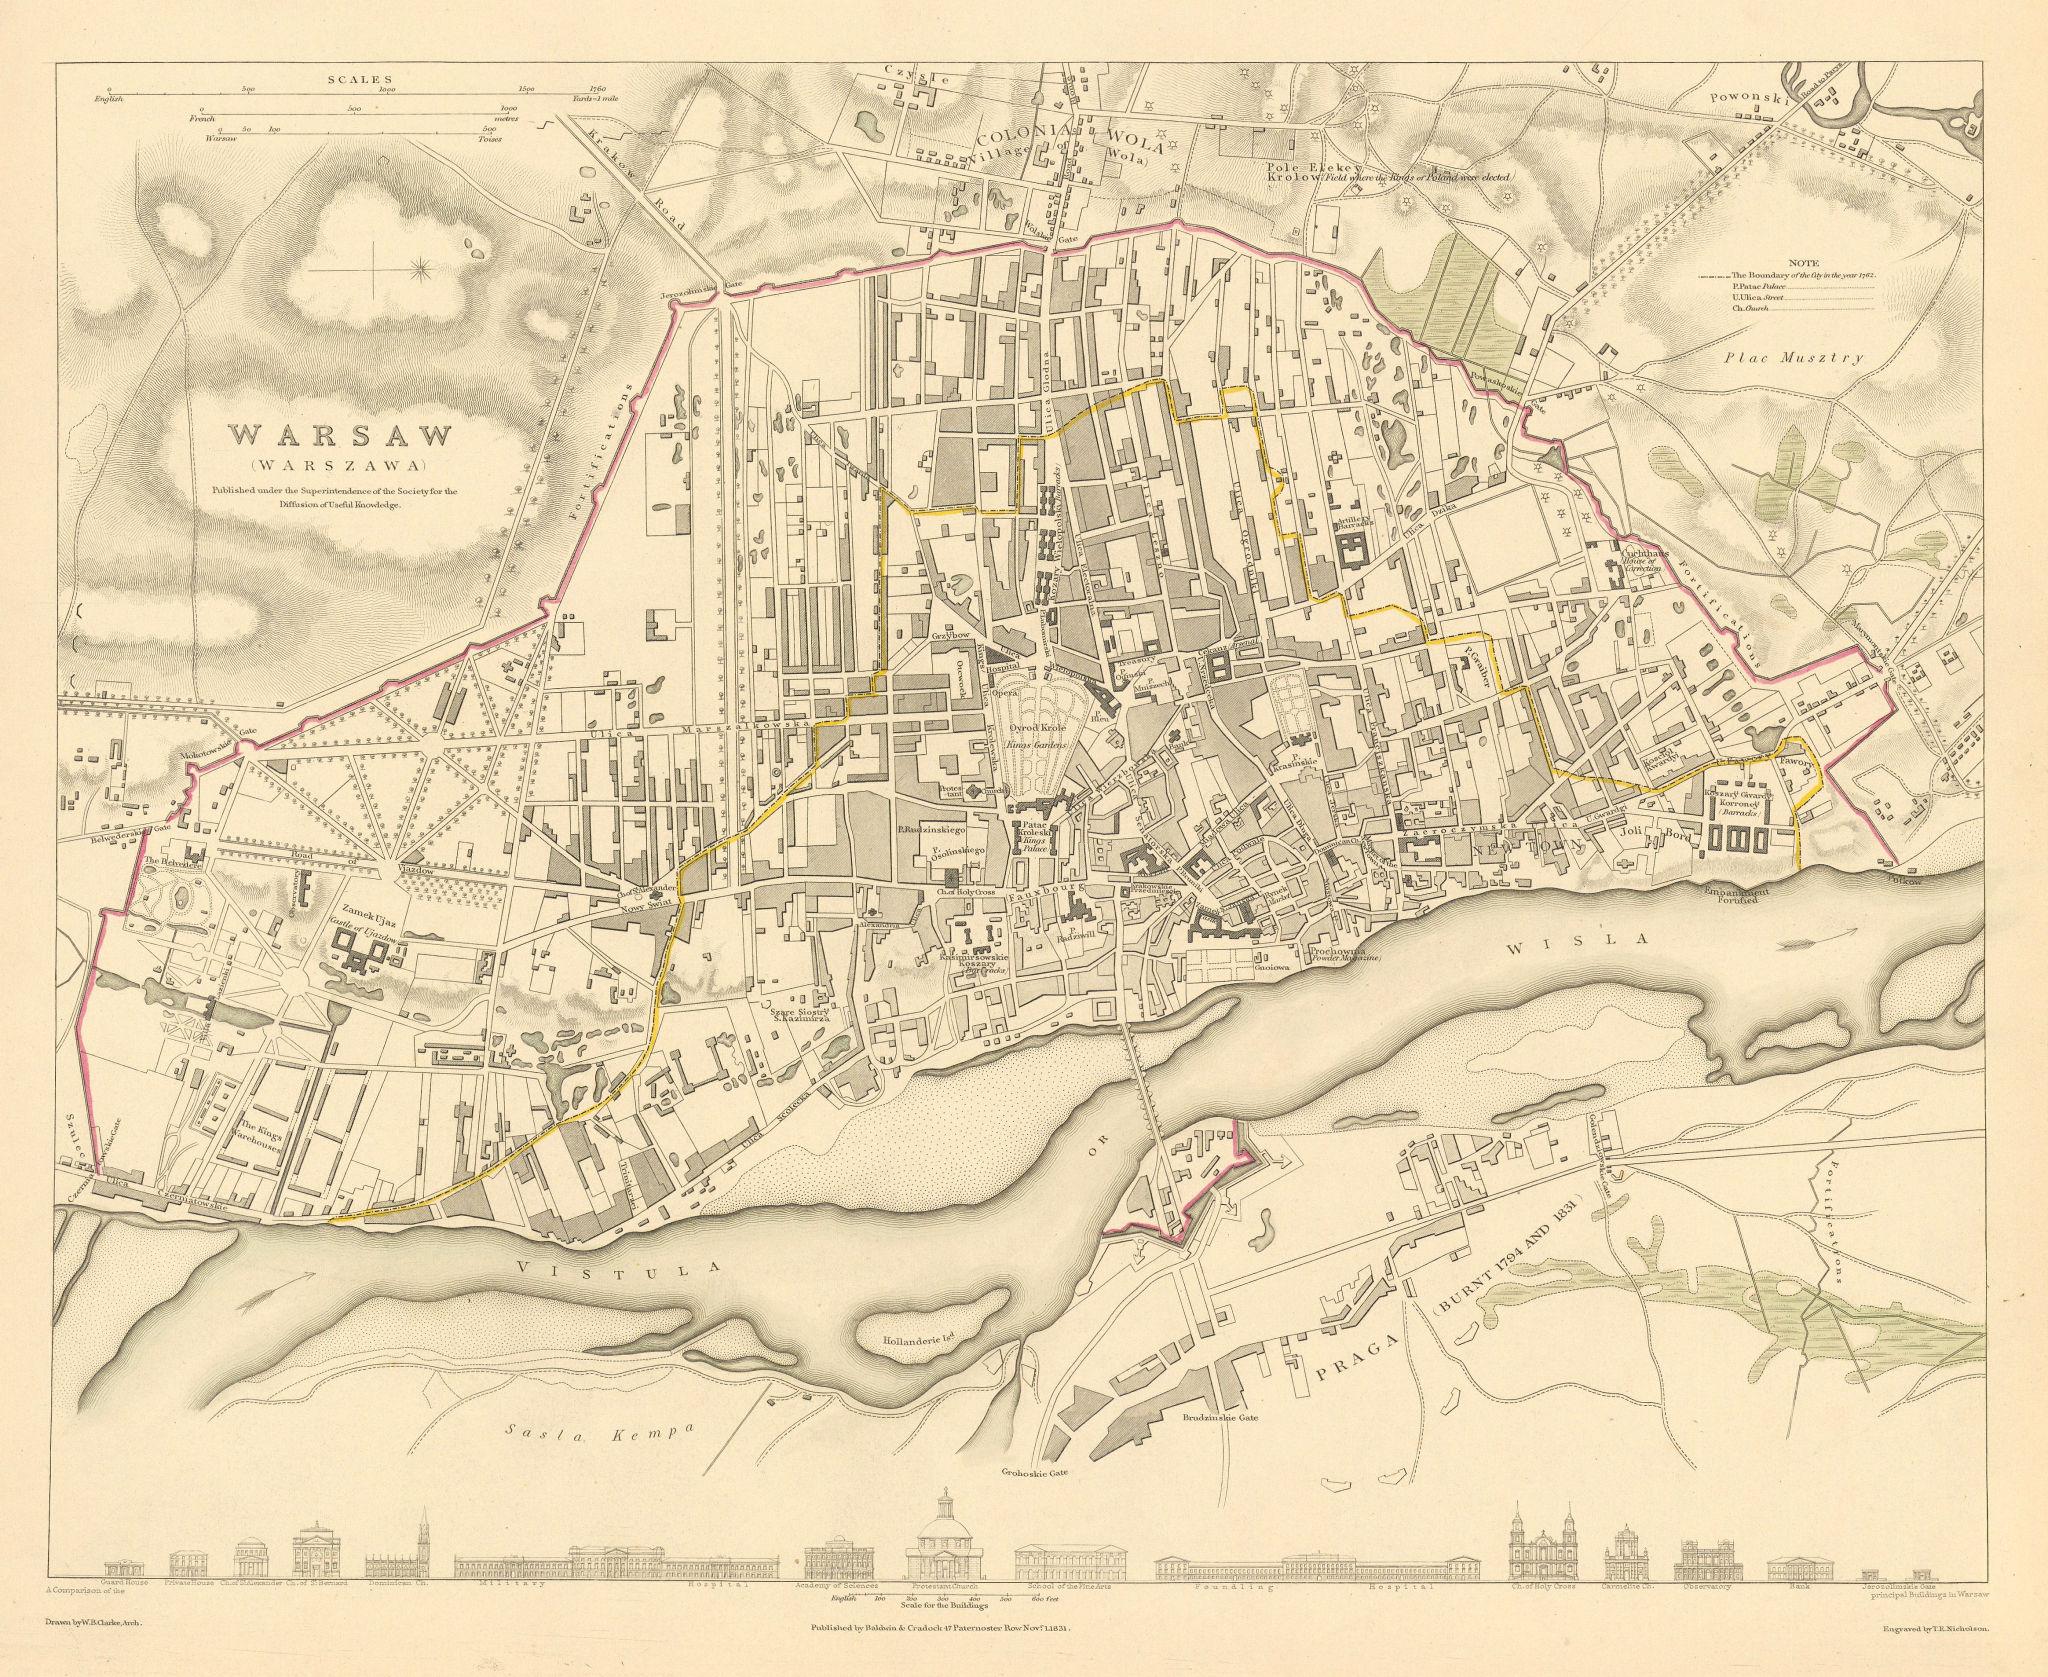 Associate Product WARSAW WARSZAWA. Antique town city map plan. Building profiles.Colour.SDUK 1844